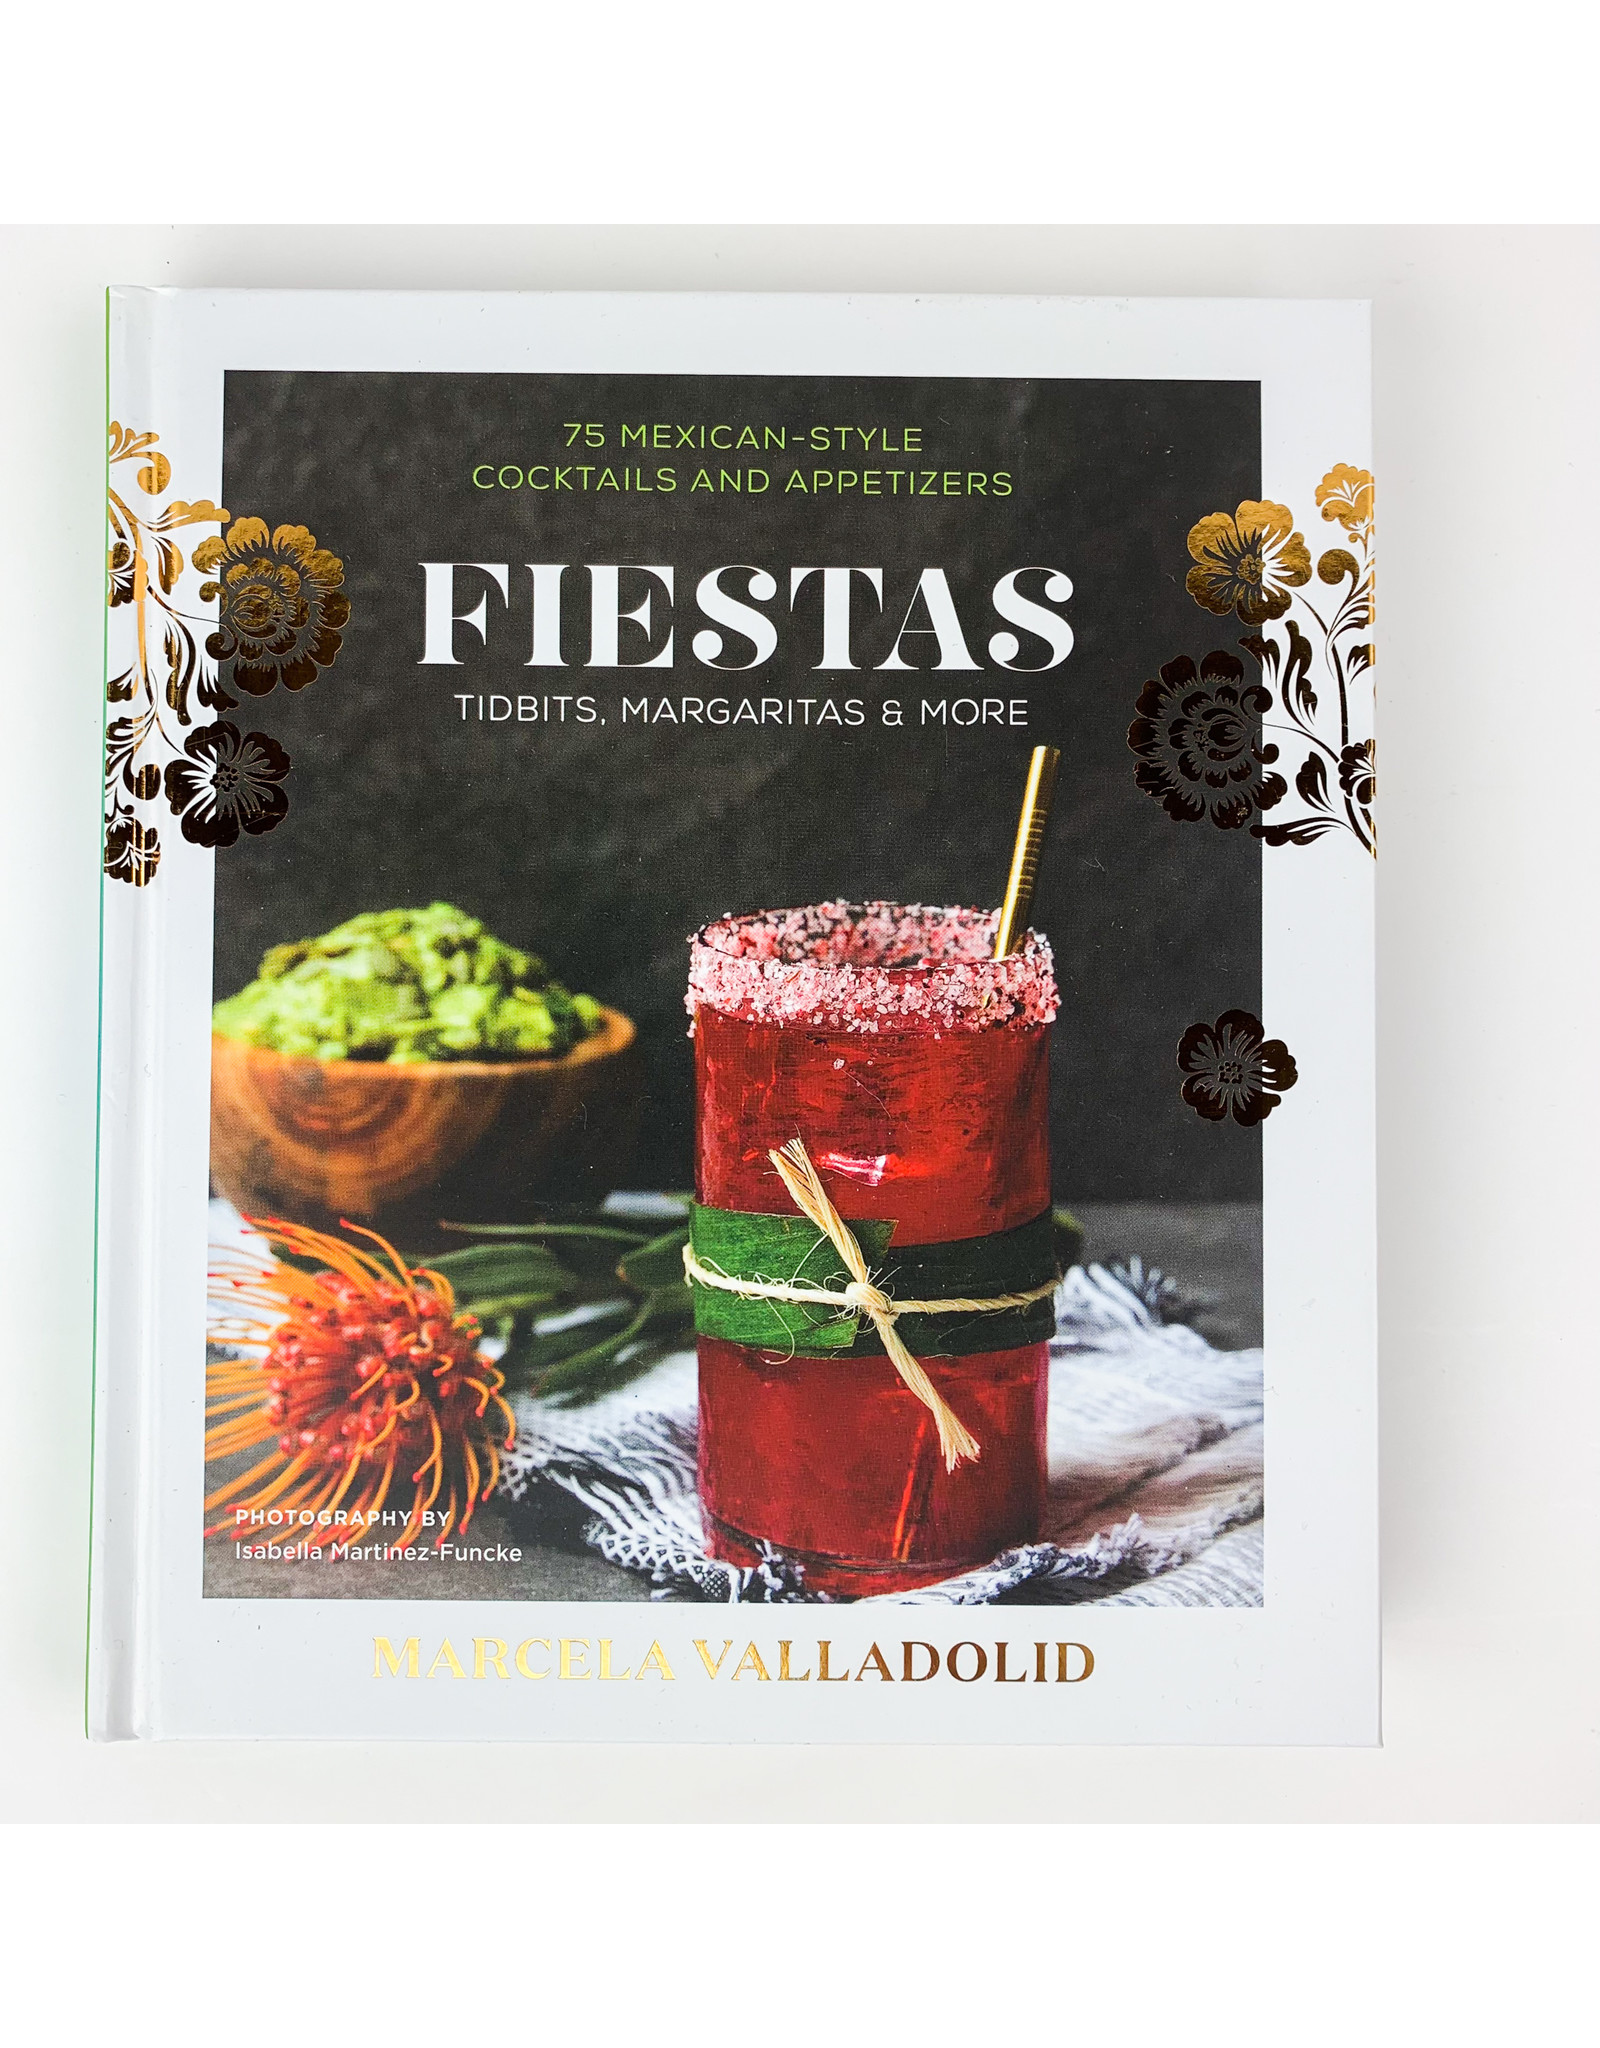 Houghton Mifflin Fiestas: Tidbits Margaritas and More